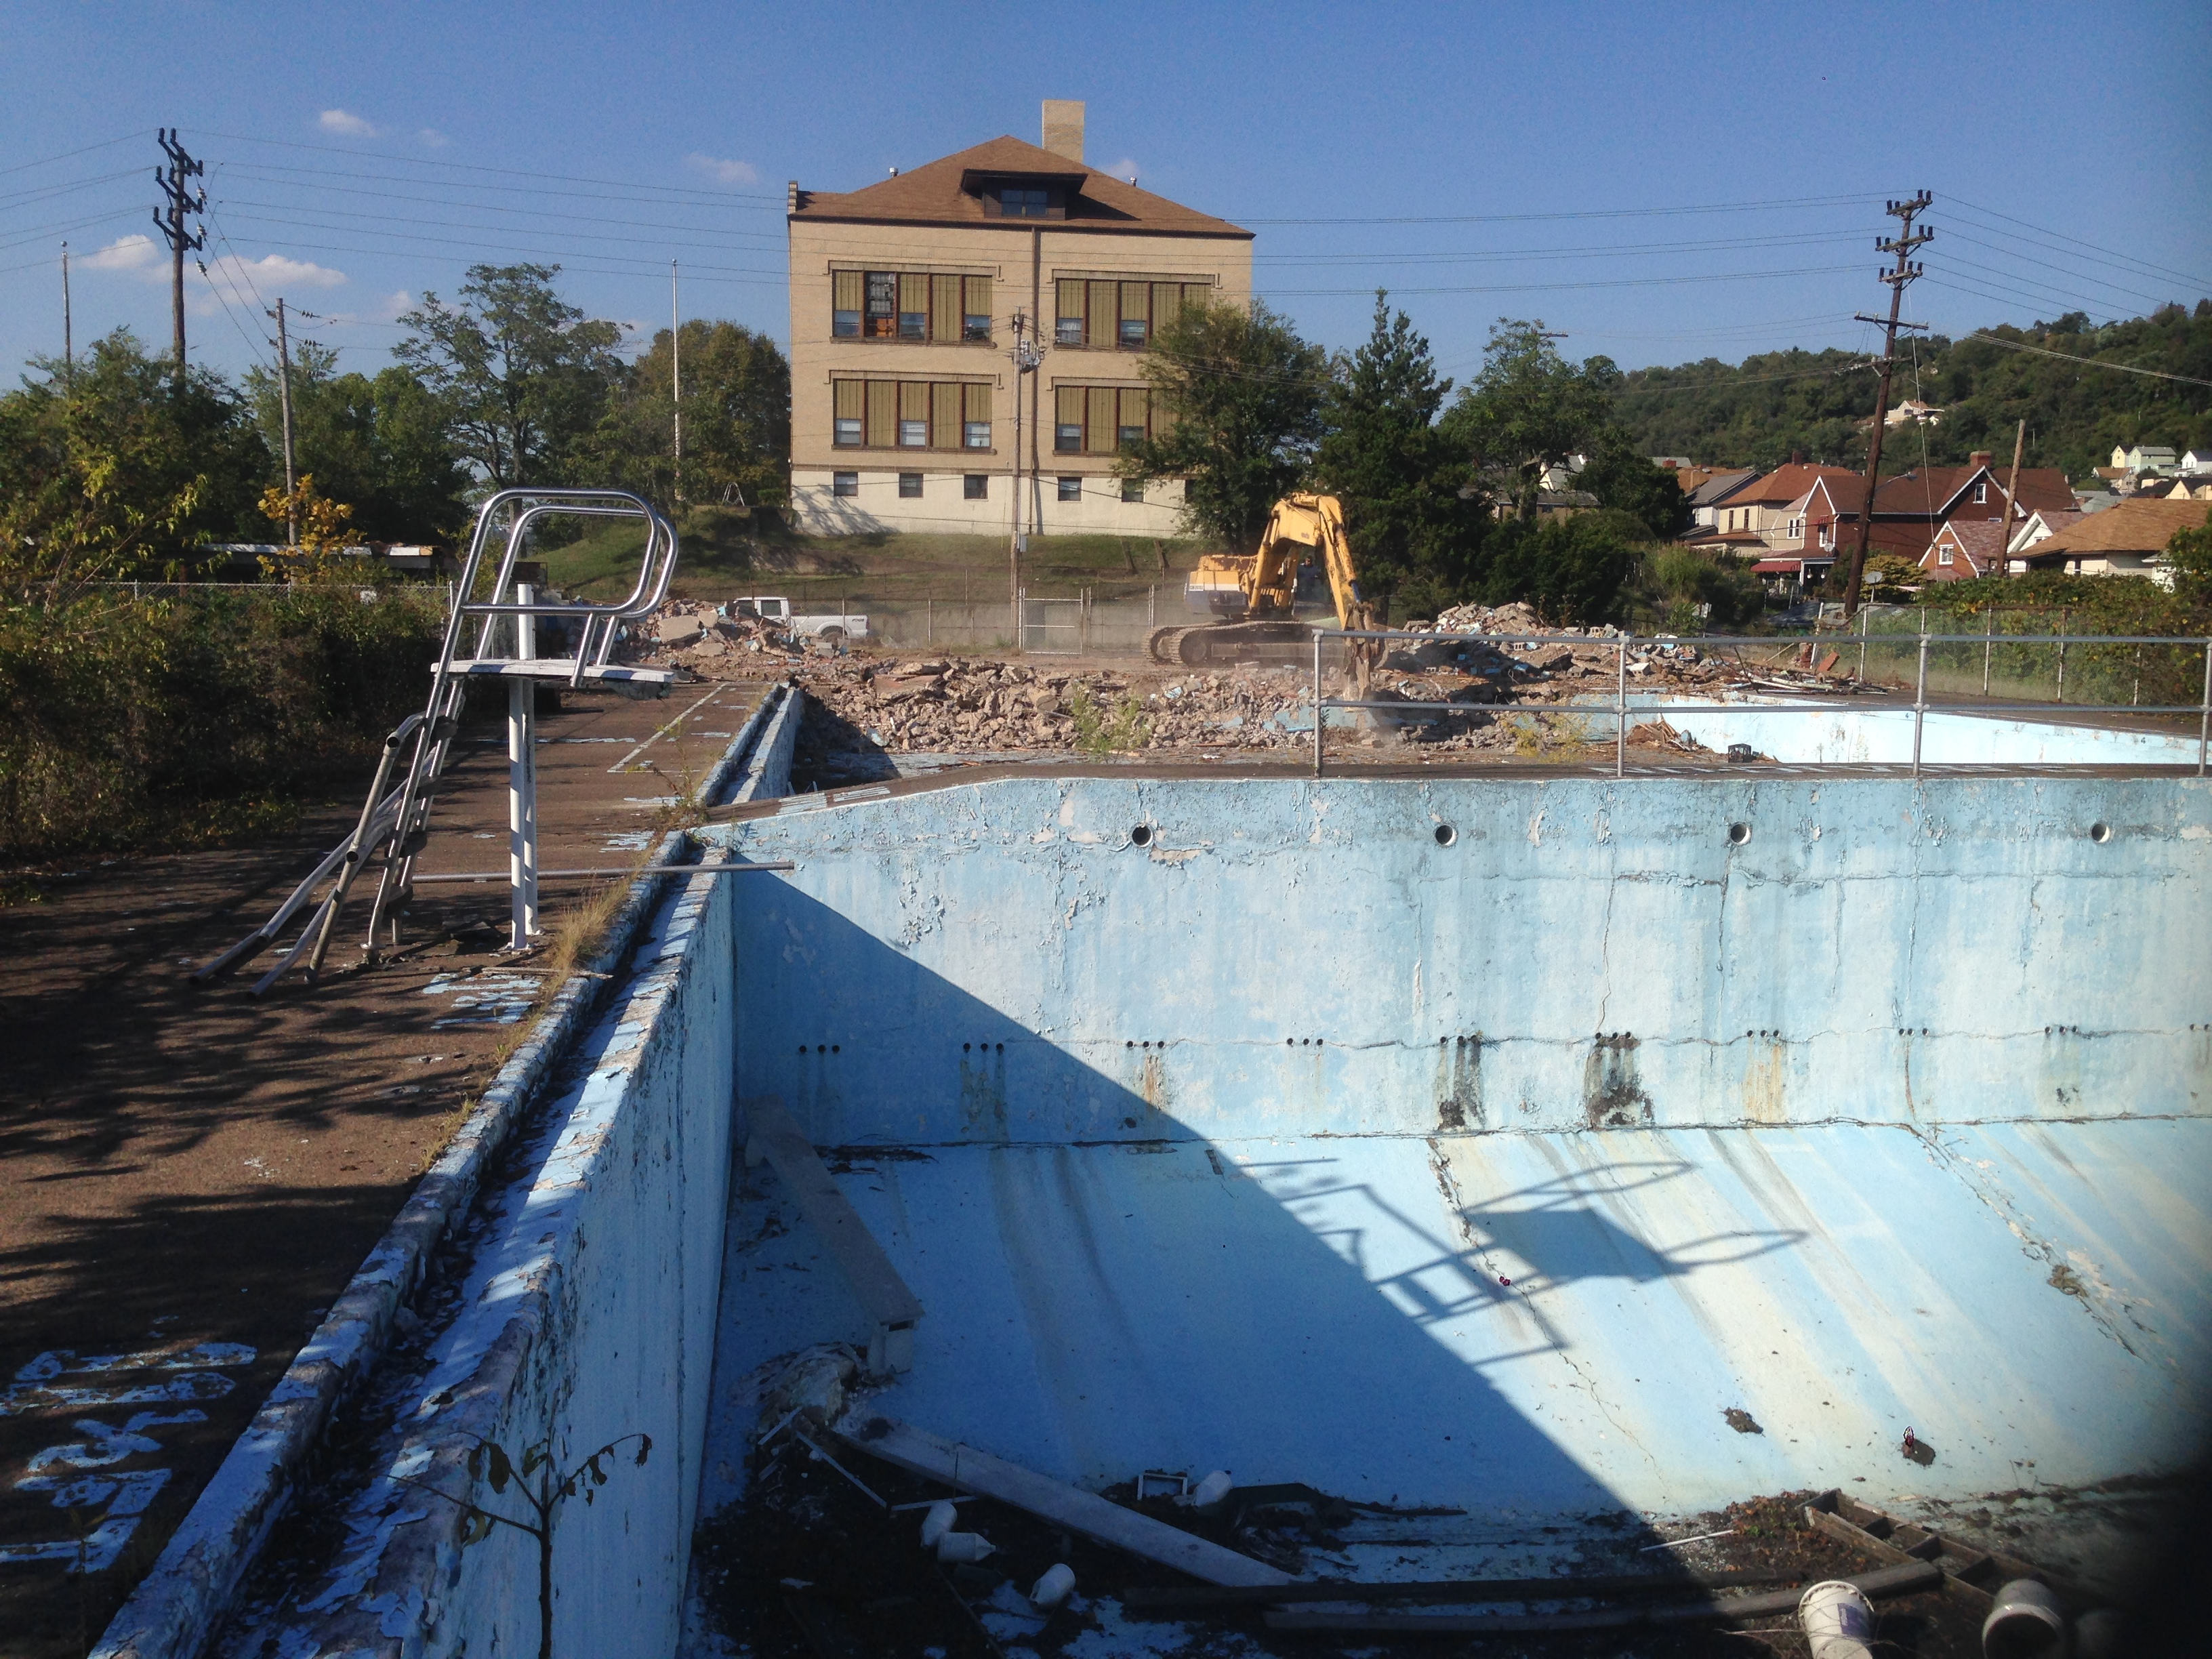 Glassport public pool demolition